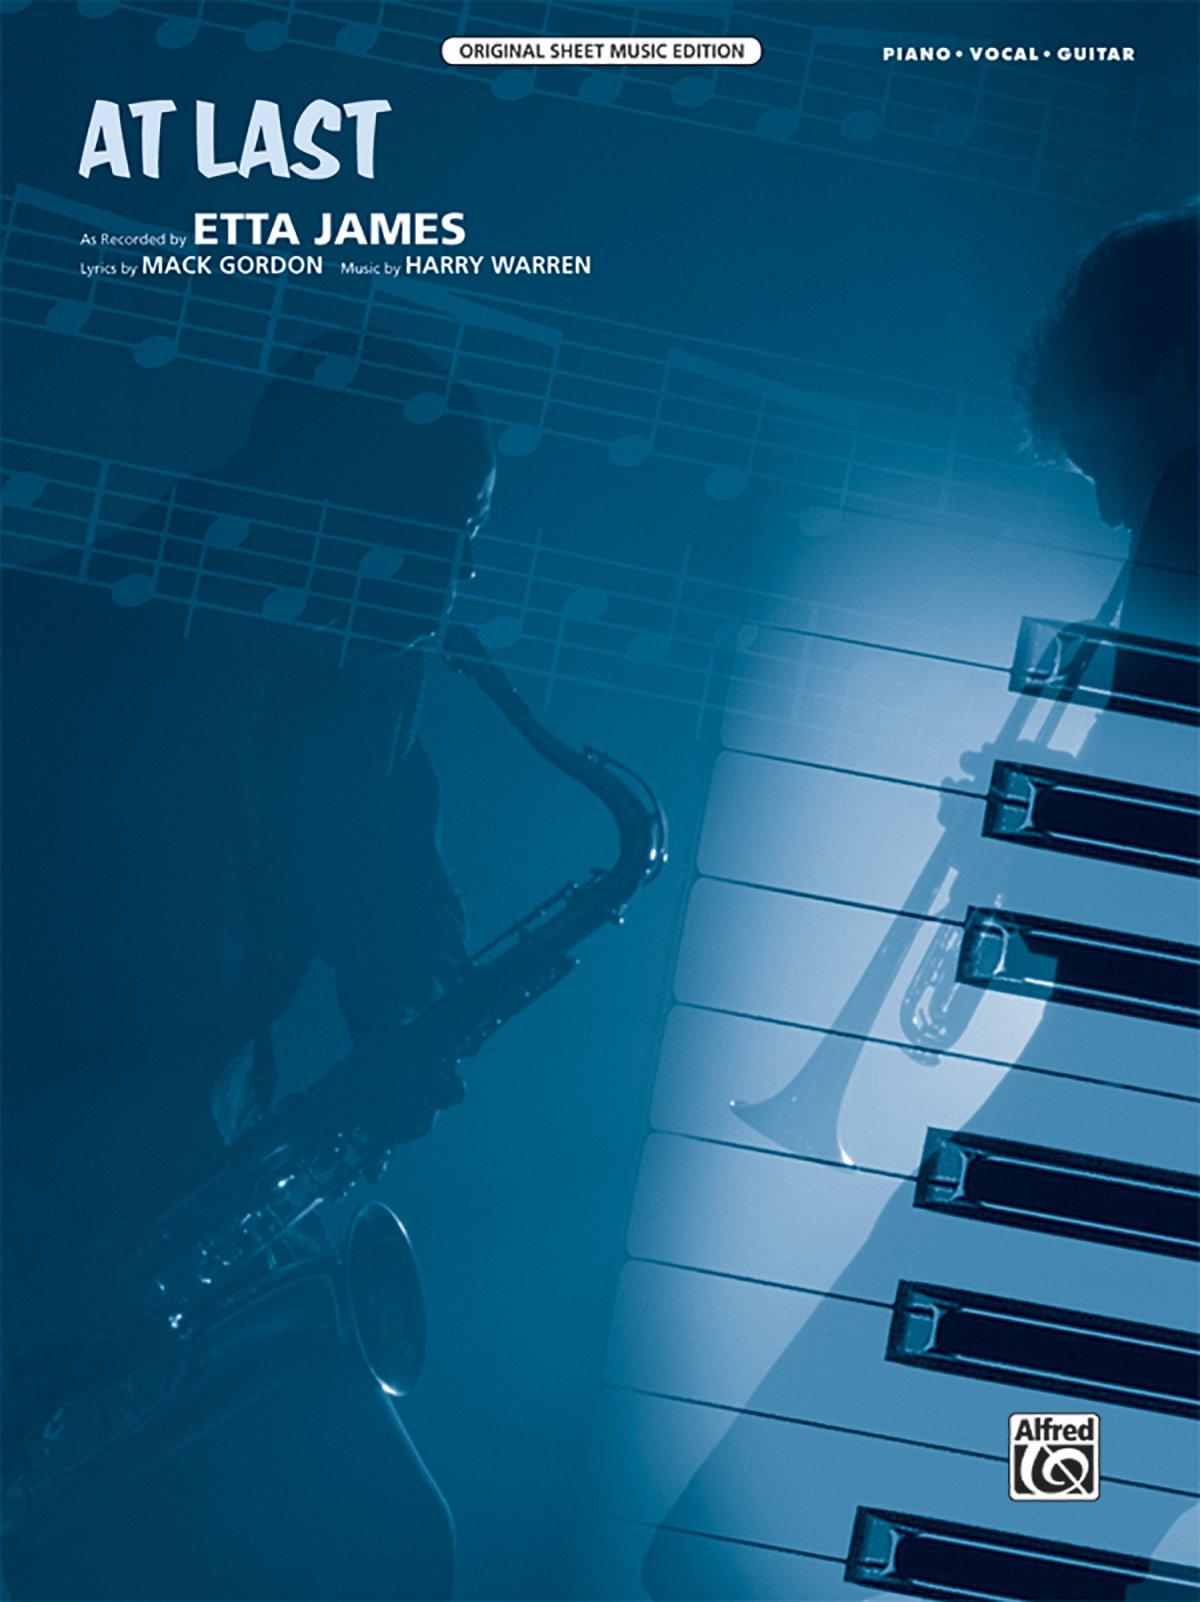 At Last Pianovocalguitar Sheet Original Sheet Music Edition